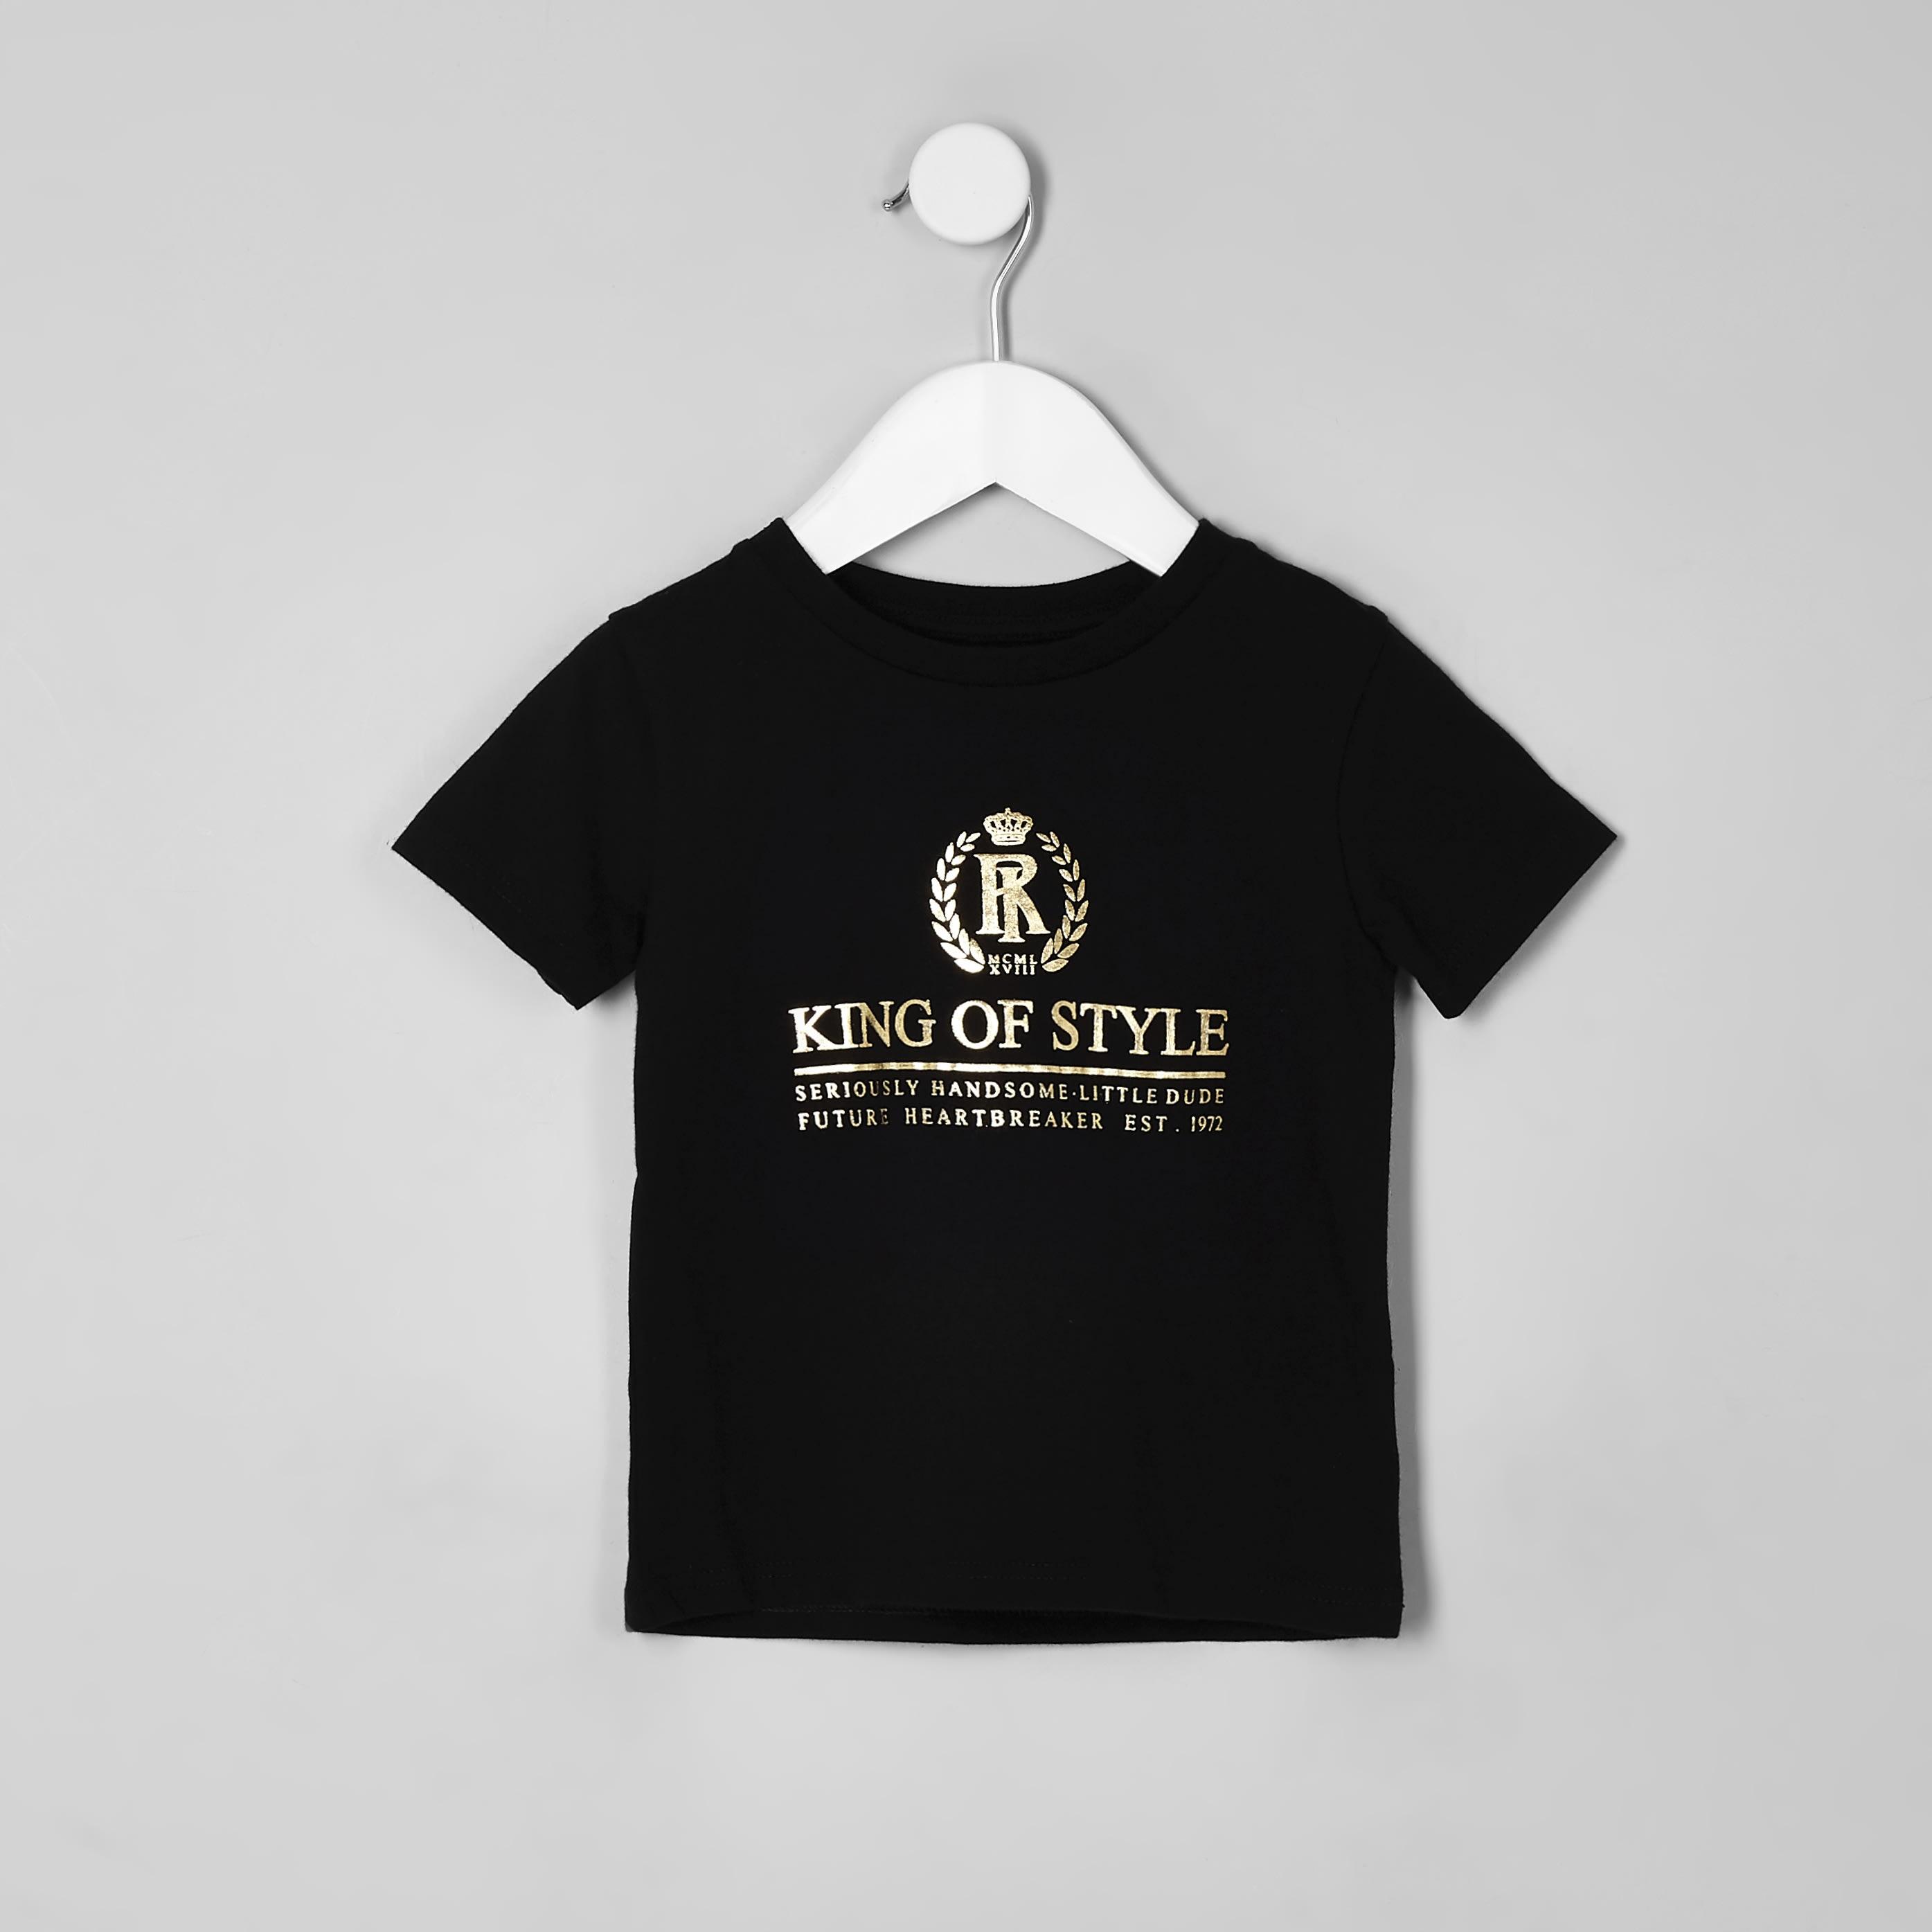 River Island Mens Baby Boys Black 'King of style' T-shirt (6-9 Mths)